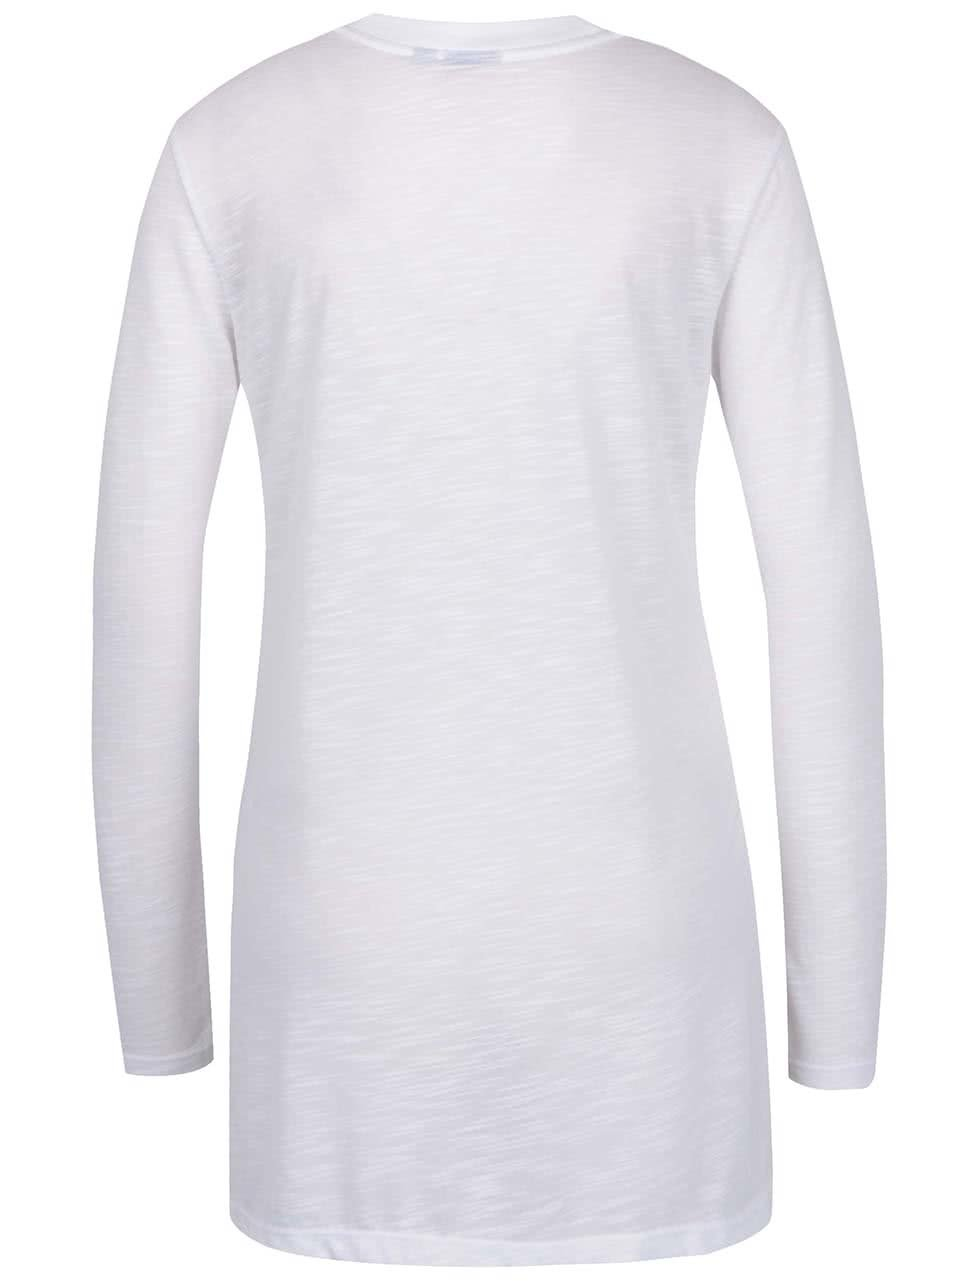 fc0b0f7874c2 Bílé dámské dlouhé průsvitné tričko adidas Originals ...